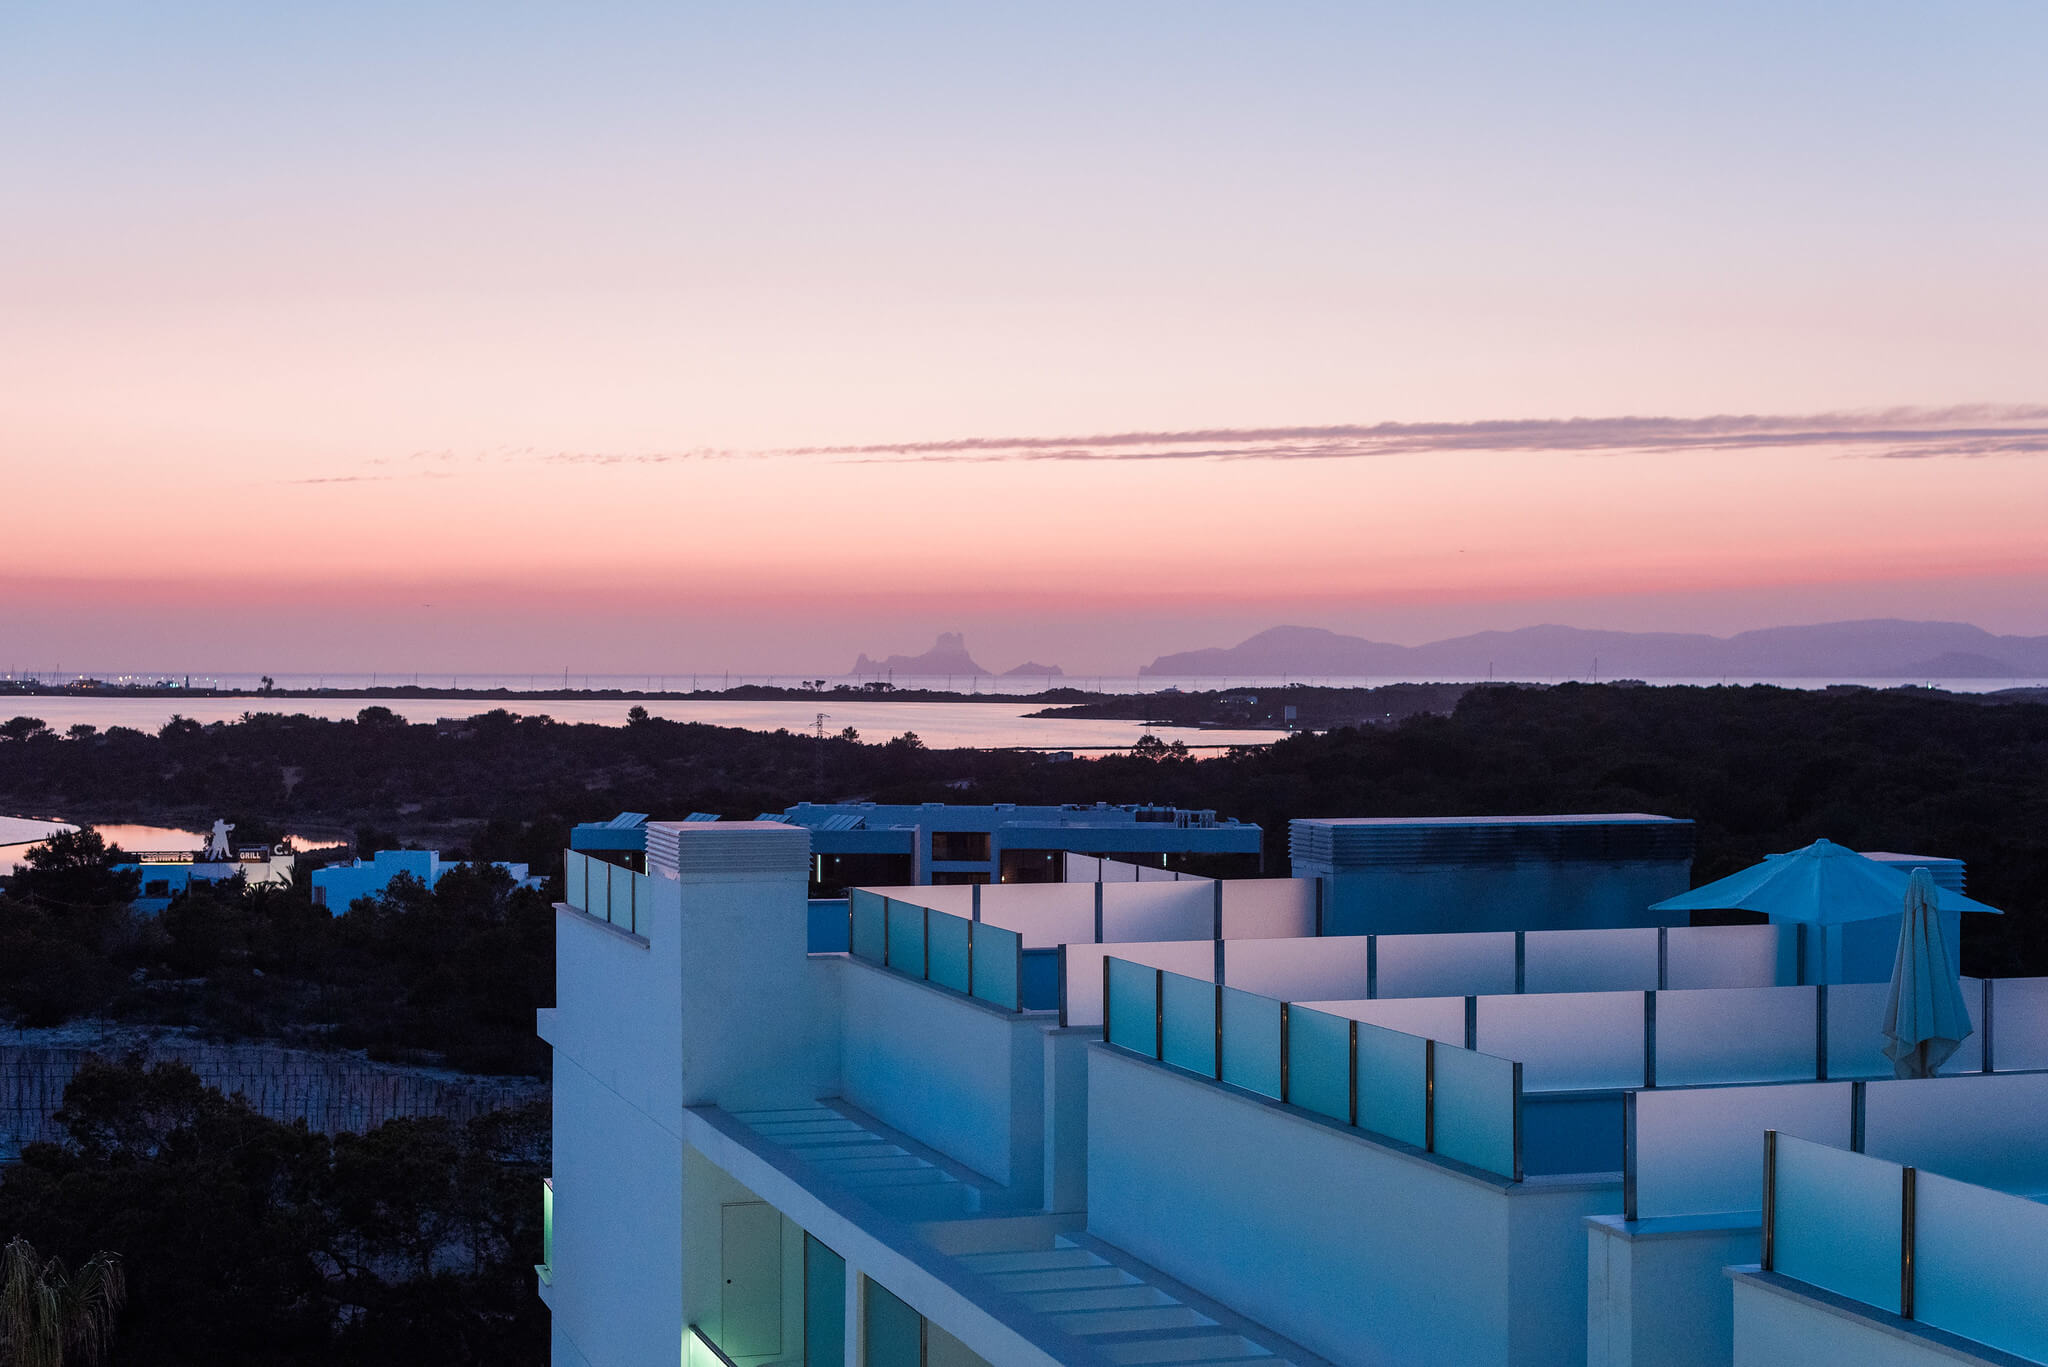 https://www.white-ibiza.com/wp-content/uploads/2020/03/formentera-hotels-five-flowers-2020-02.jpg